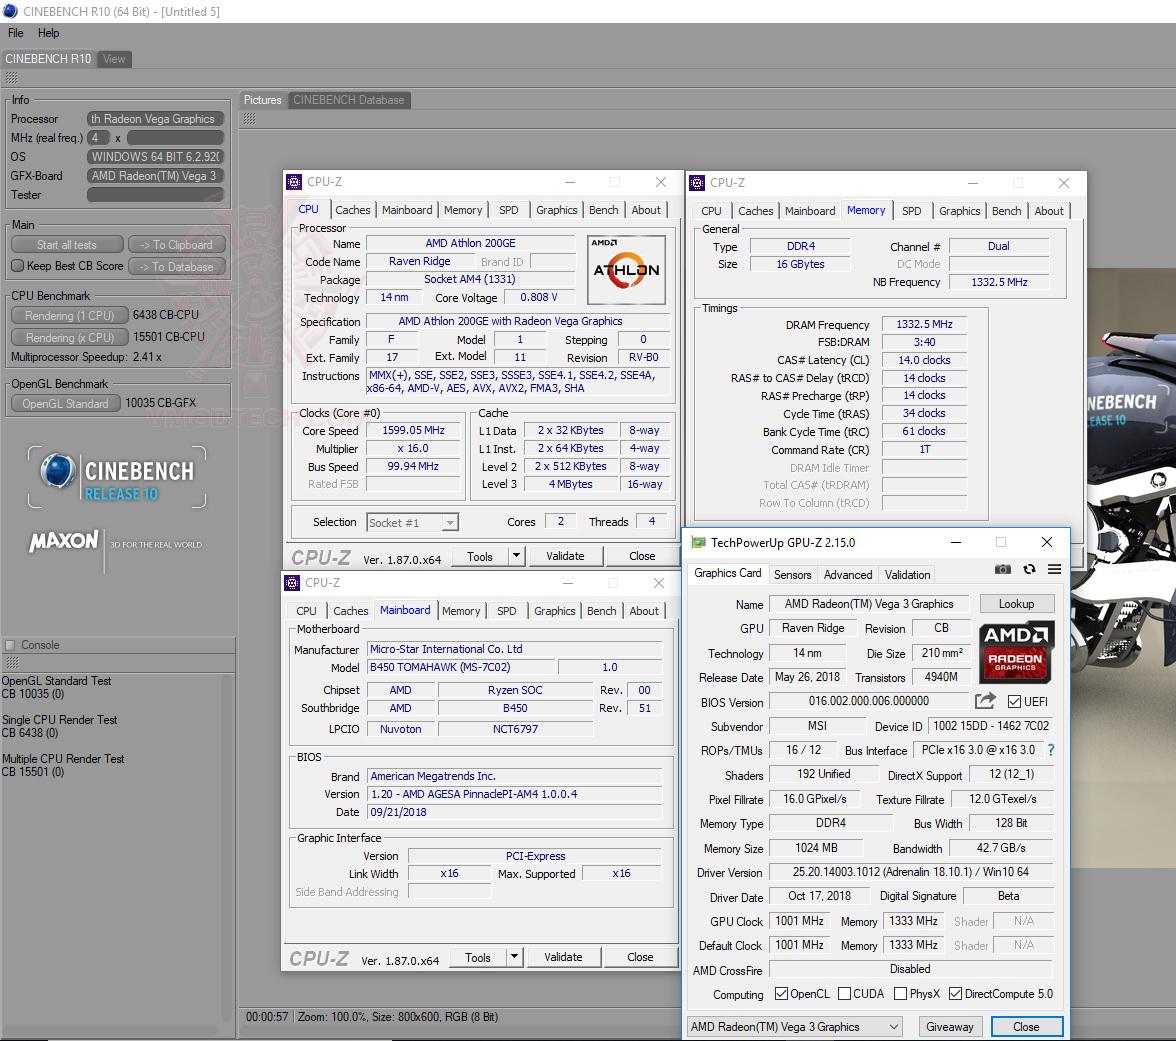 c10 AMD Athlon 200GE Processor with Radeon Vega 3 Graphics Review